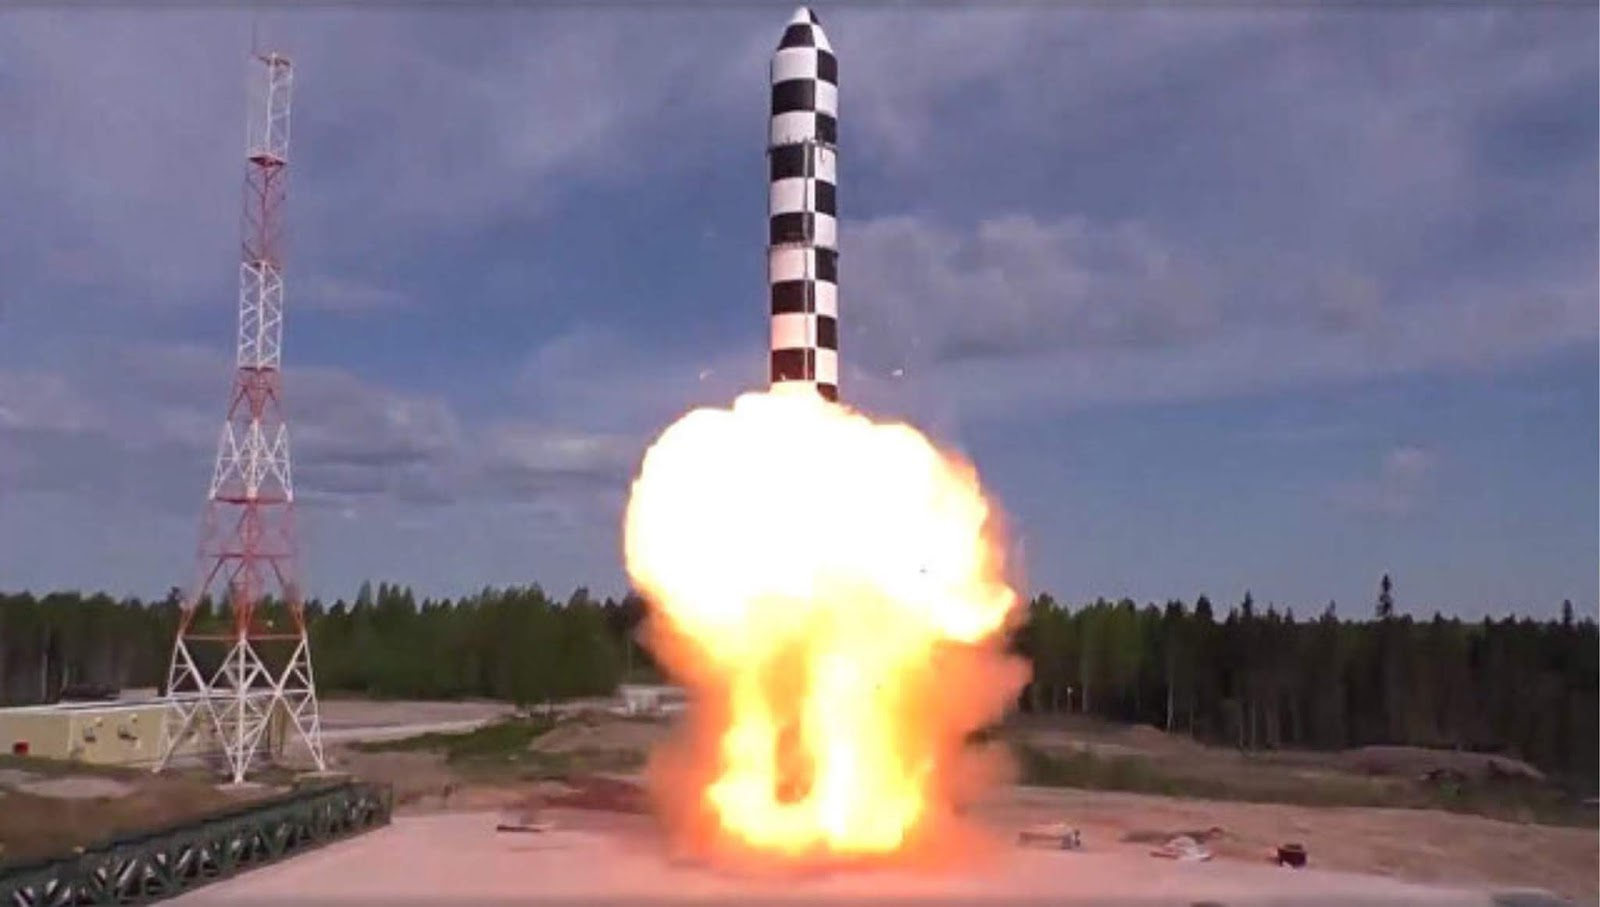 Senjata Nuklir Rusia Adalah Ancaman Paling Utama Bagi Keamanan AS